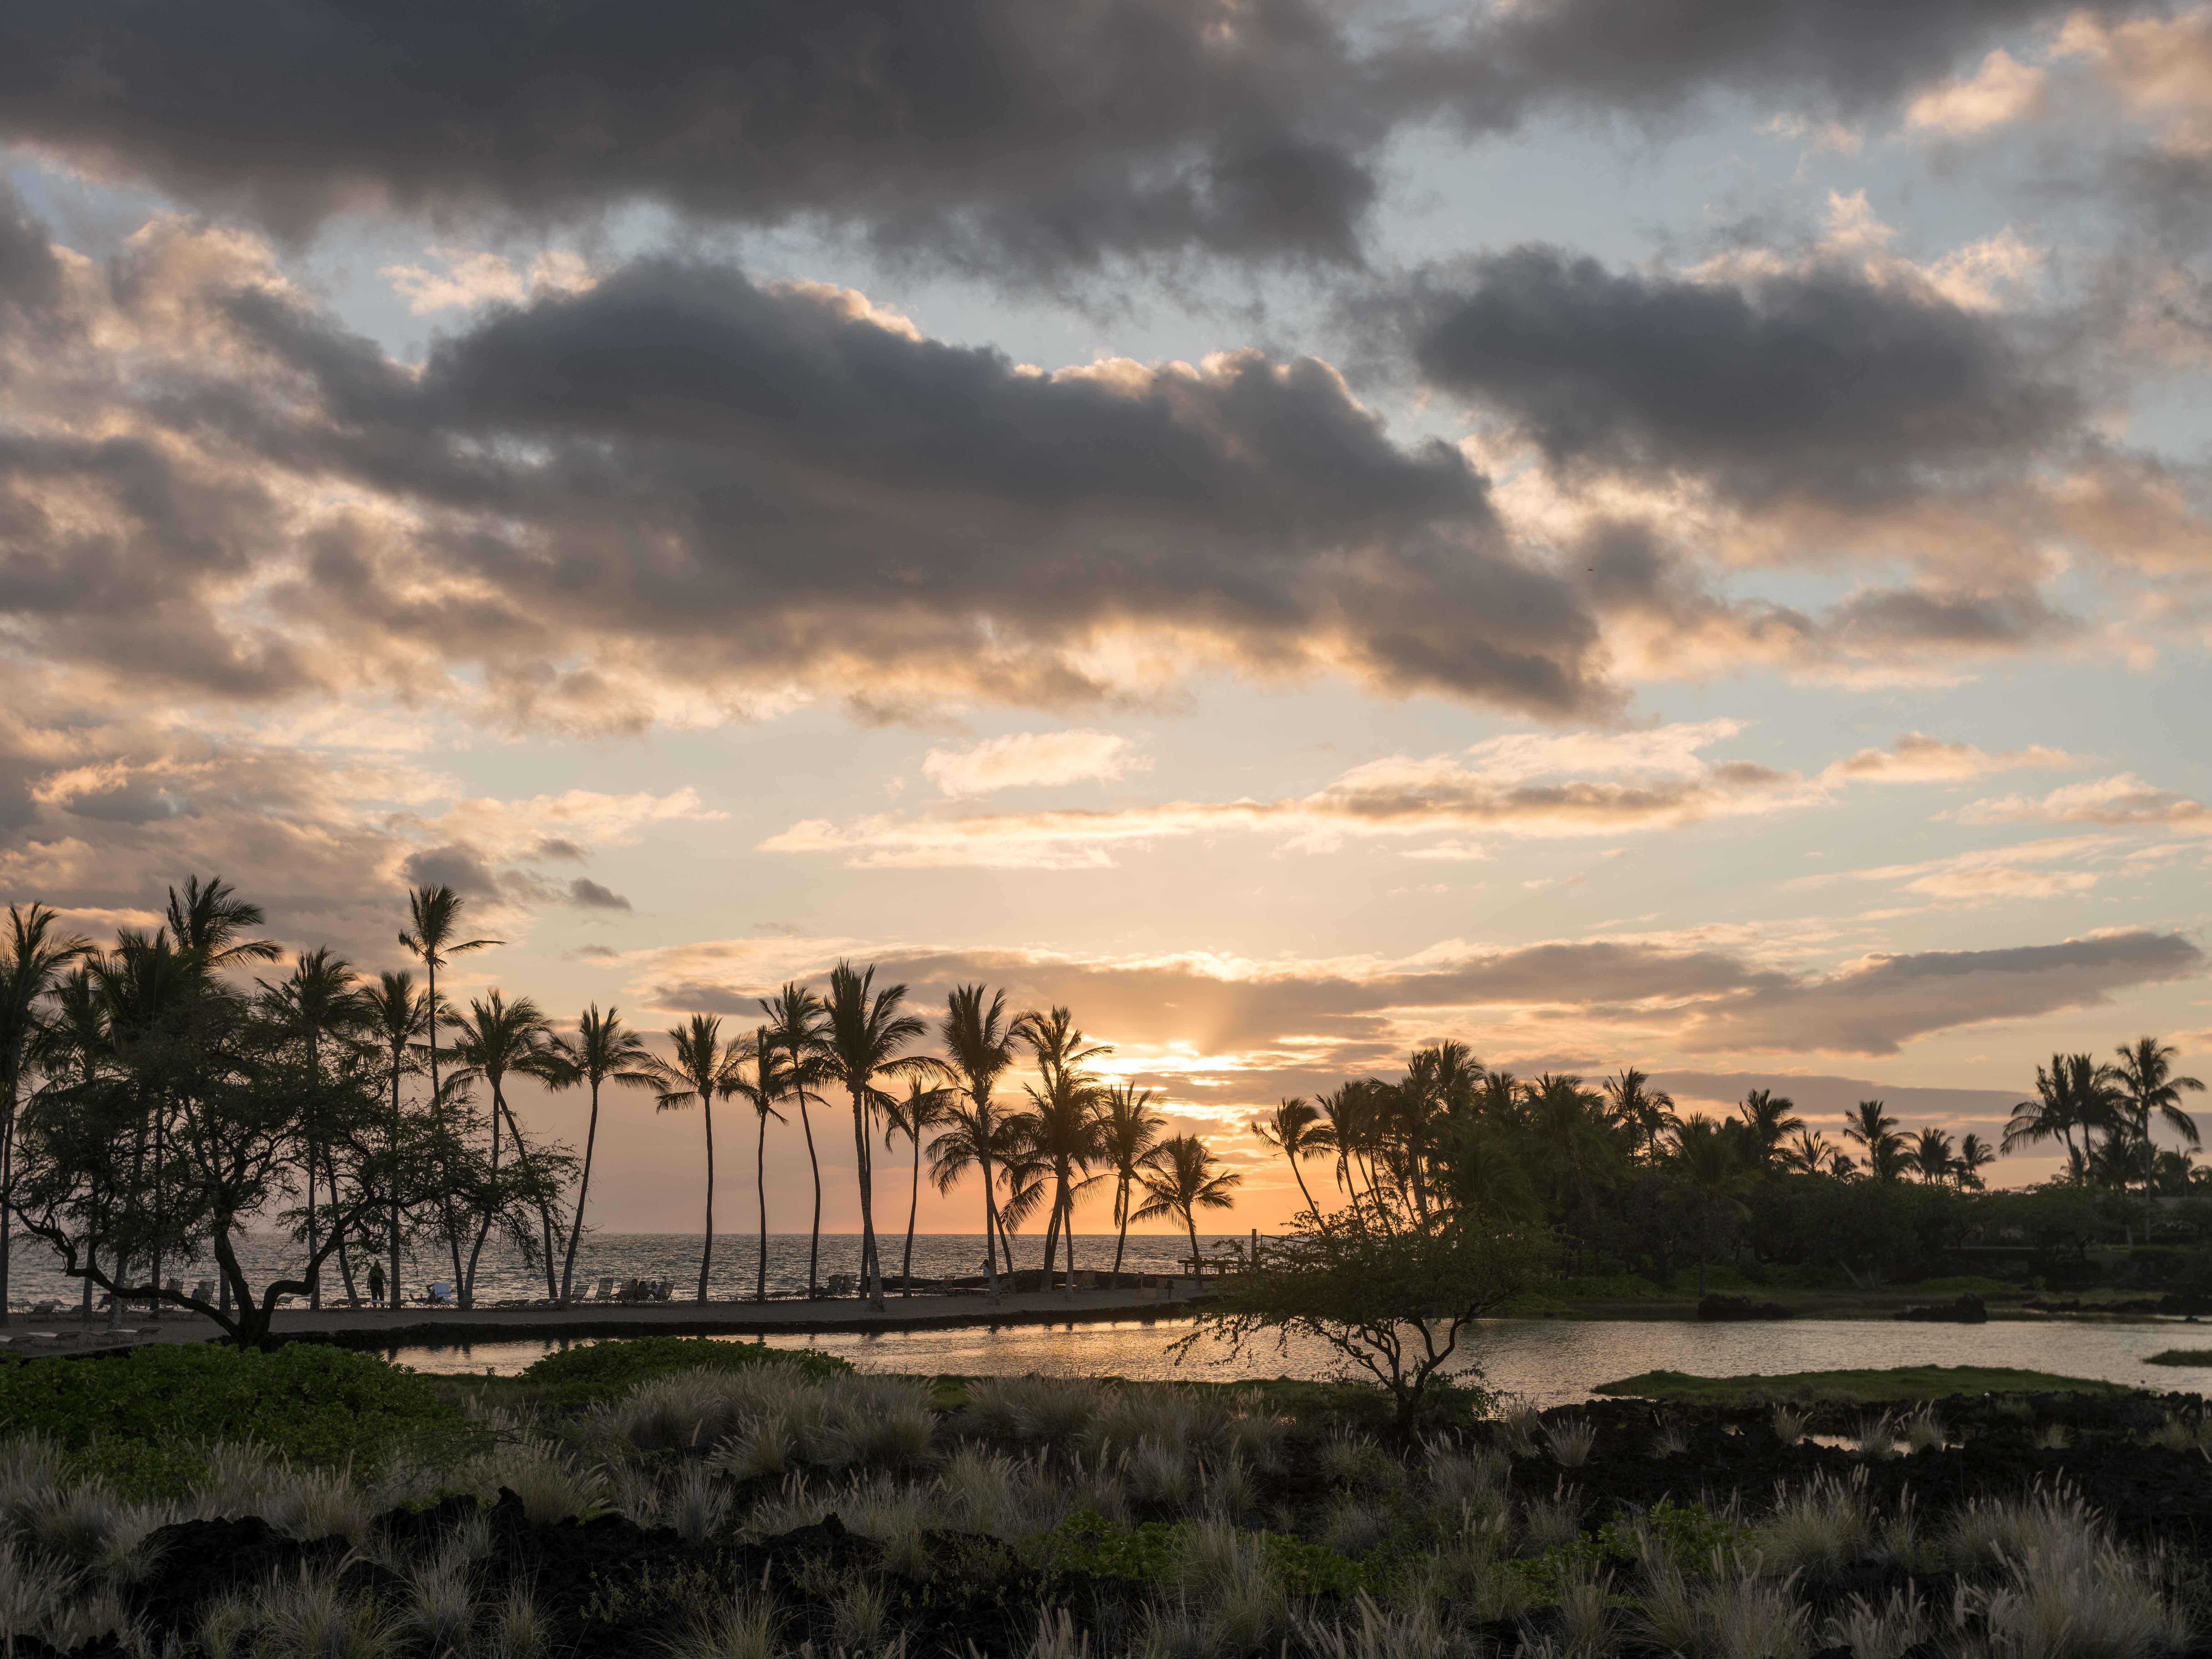 Marriott's Waikoloa Ocean Club Sun Setting. Marriott's Waikoloa Ocean Club is located in Waikoloa Beach, Big Island, Hawai'i United States.